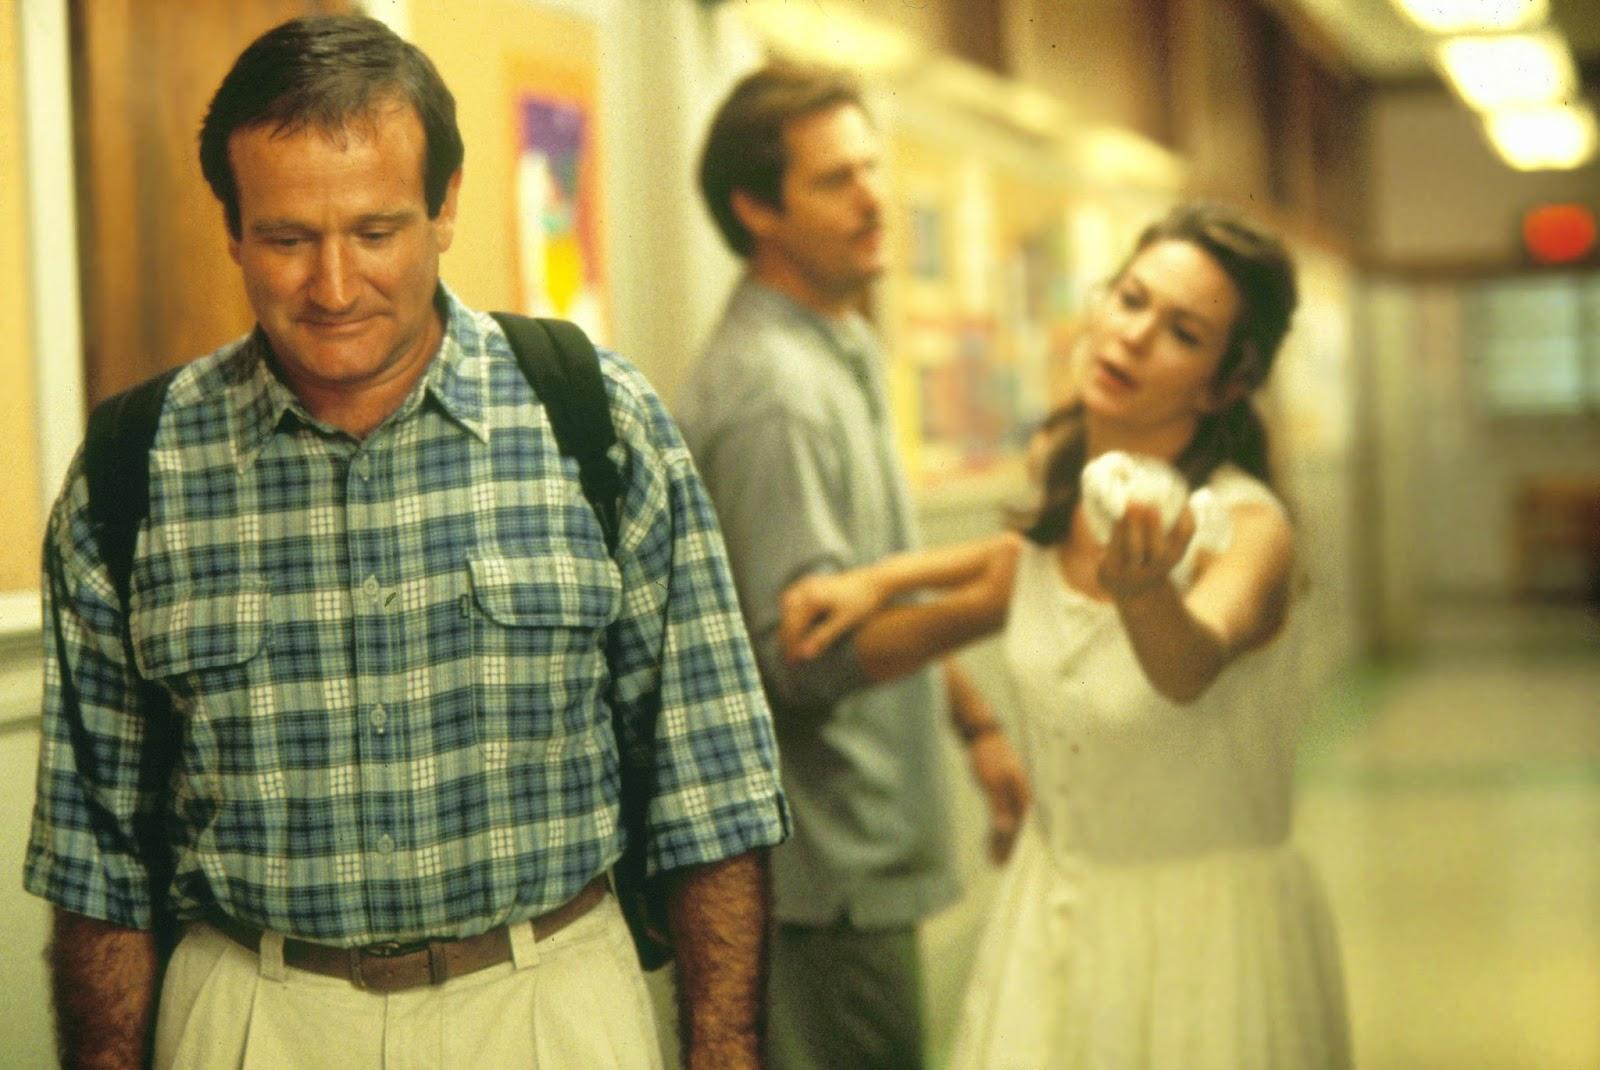 Jack Robin Williams